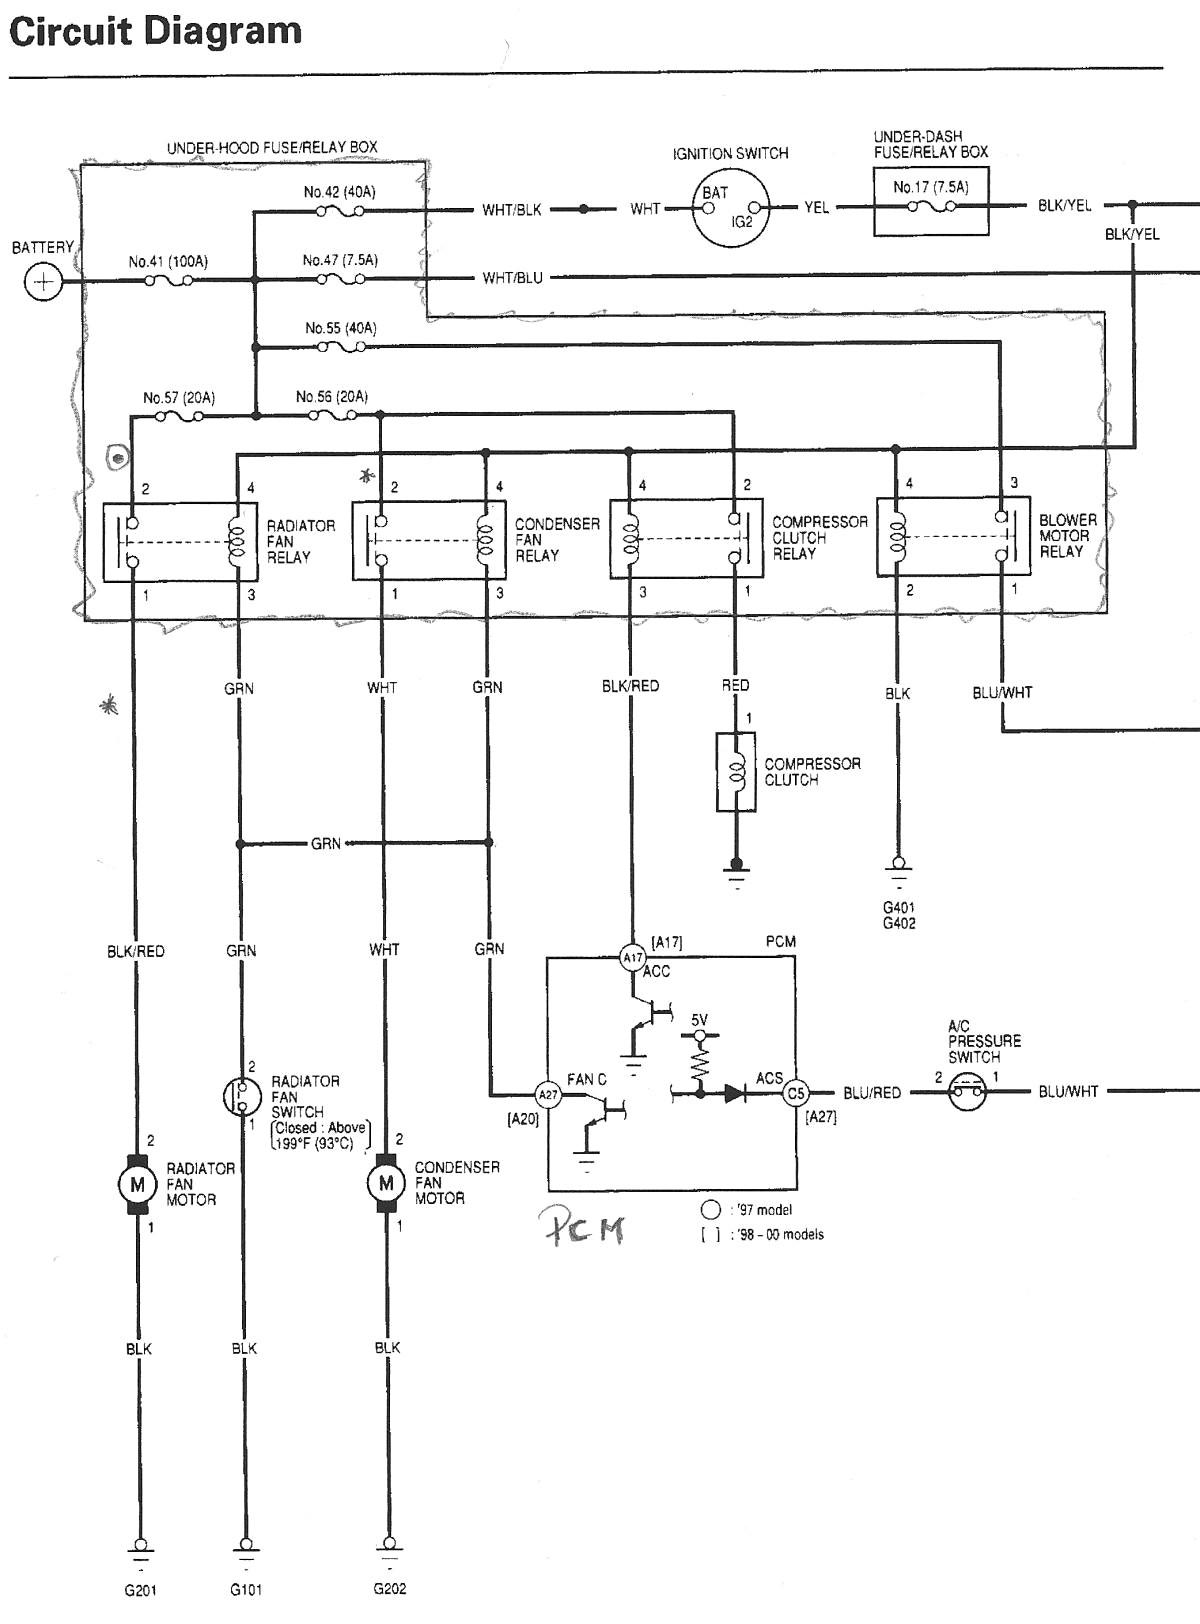 1990 Honda Civic Engine Diagram 2003 Accord Stereo Wiring International Truck Radio And Adorable Blurts